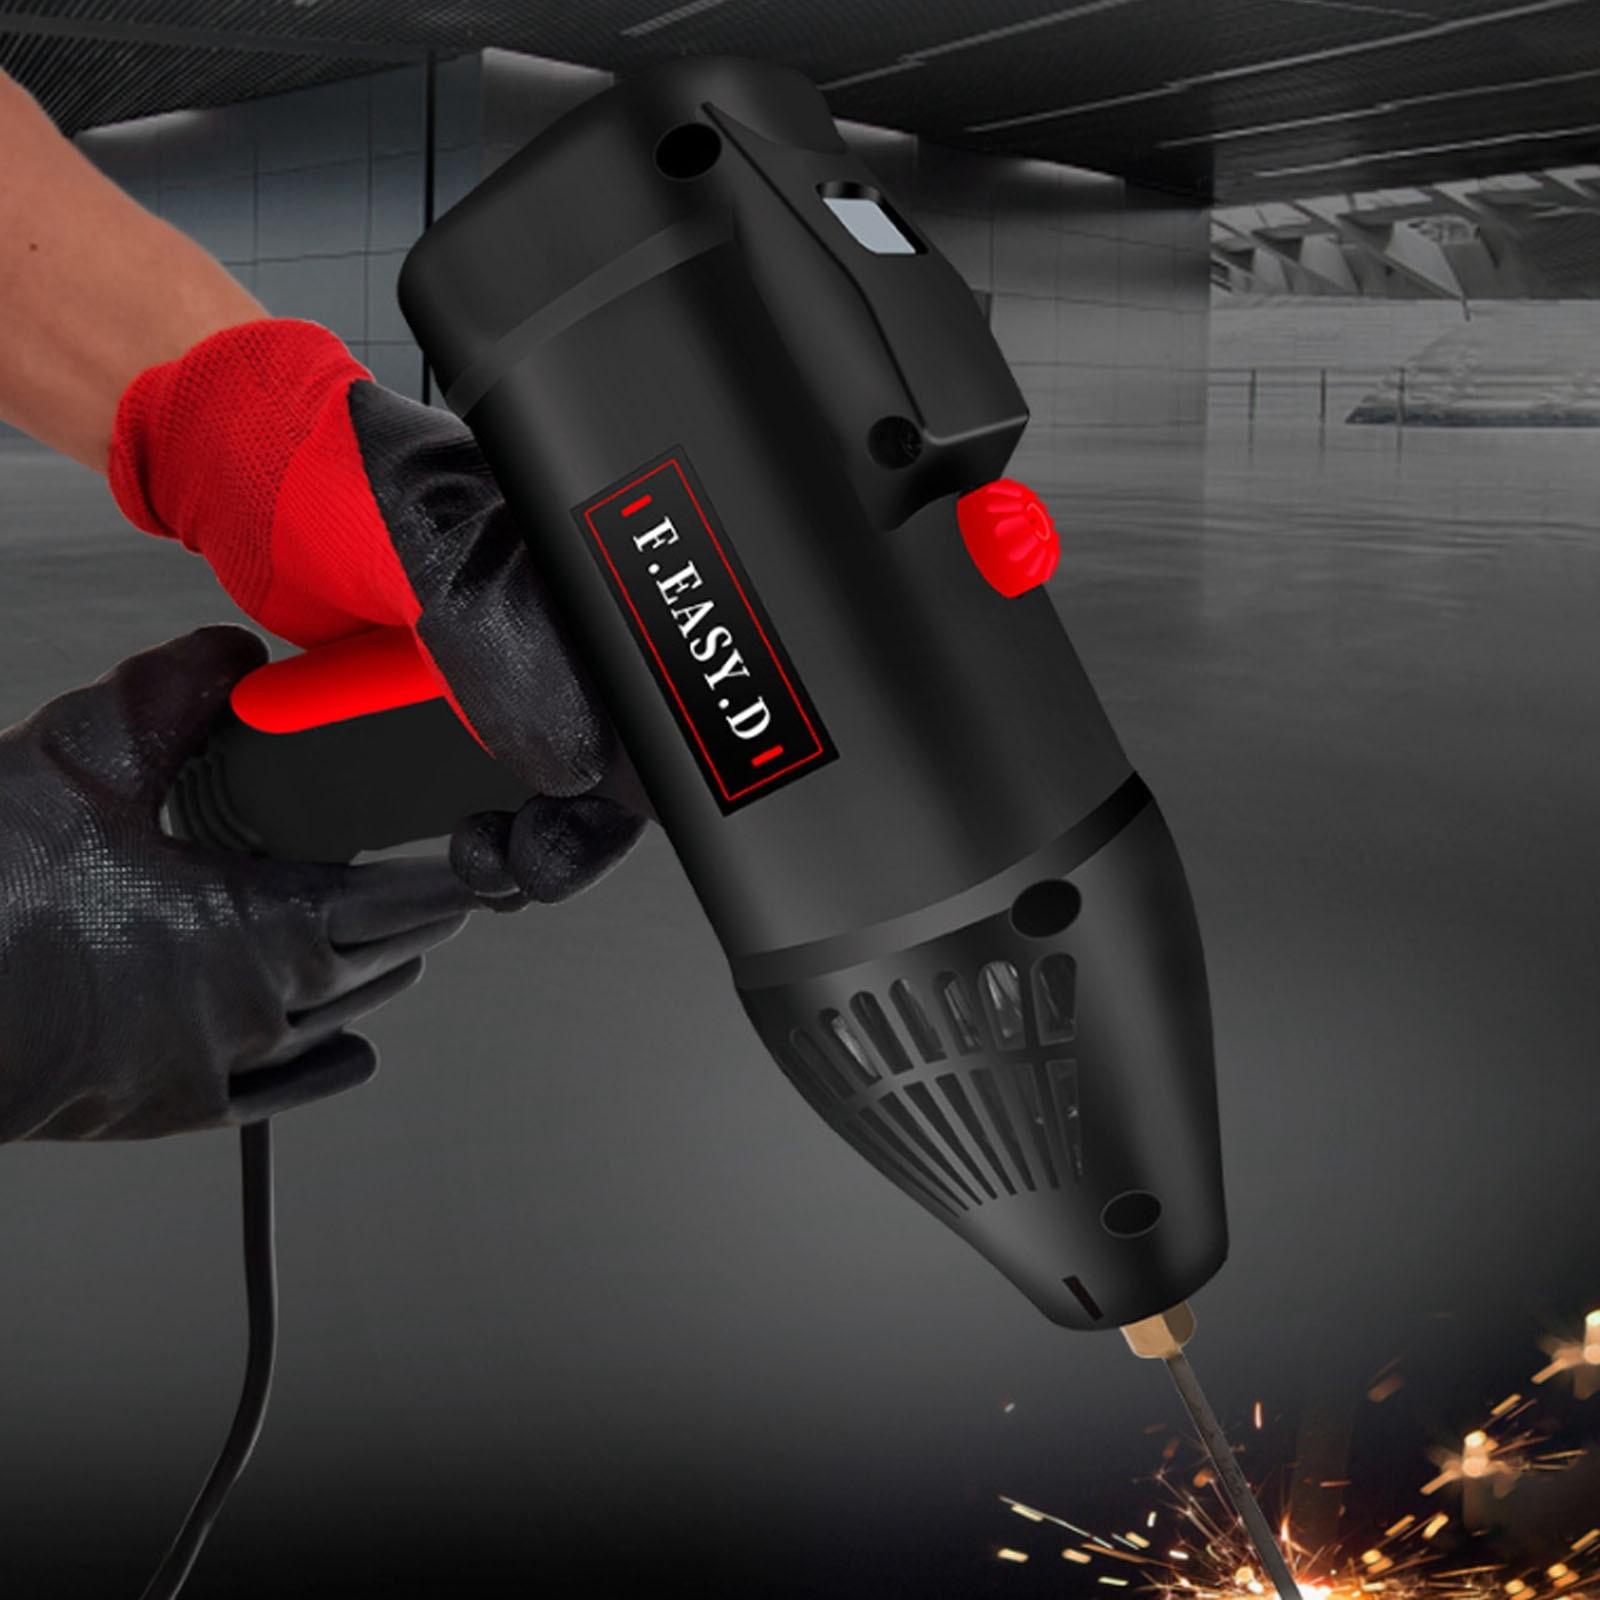 220V Handheld Electric Welding Machine Automatic Digital Intelligent Welding Equipment Home Current Thrust Adjustment Knob Black enlarge